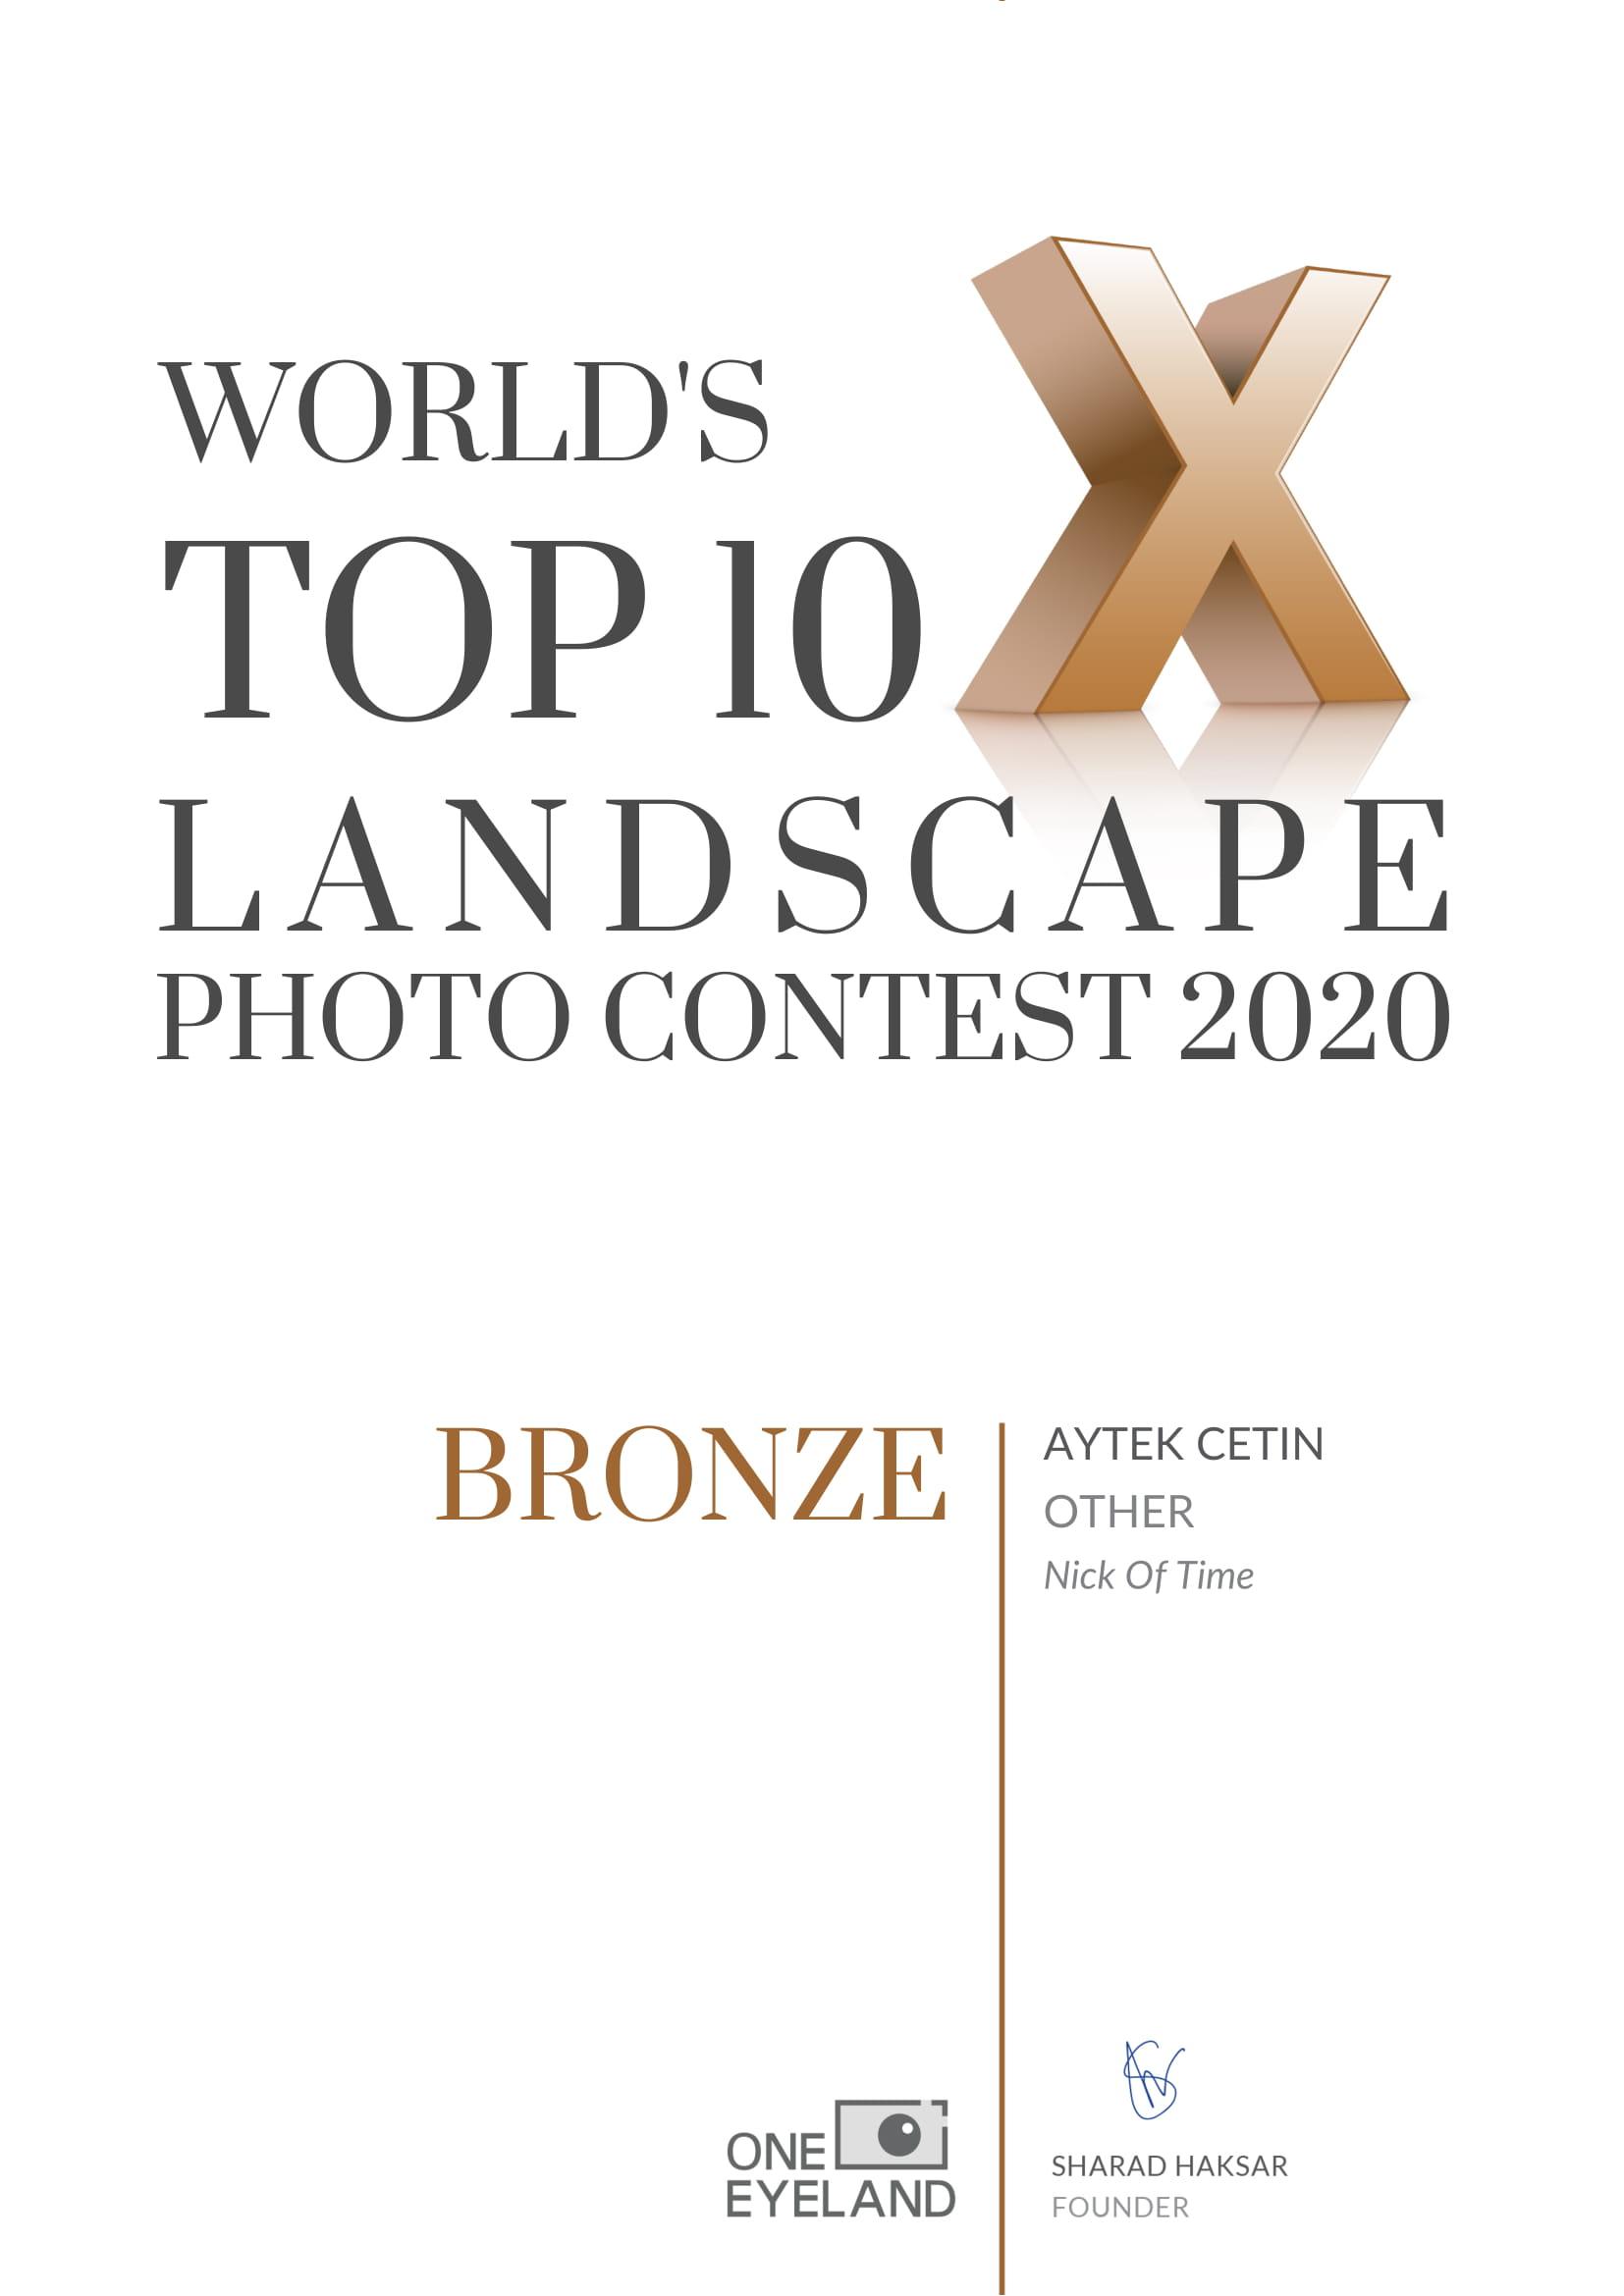 aytek-cetin-bronze-landscape-other-2020-1